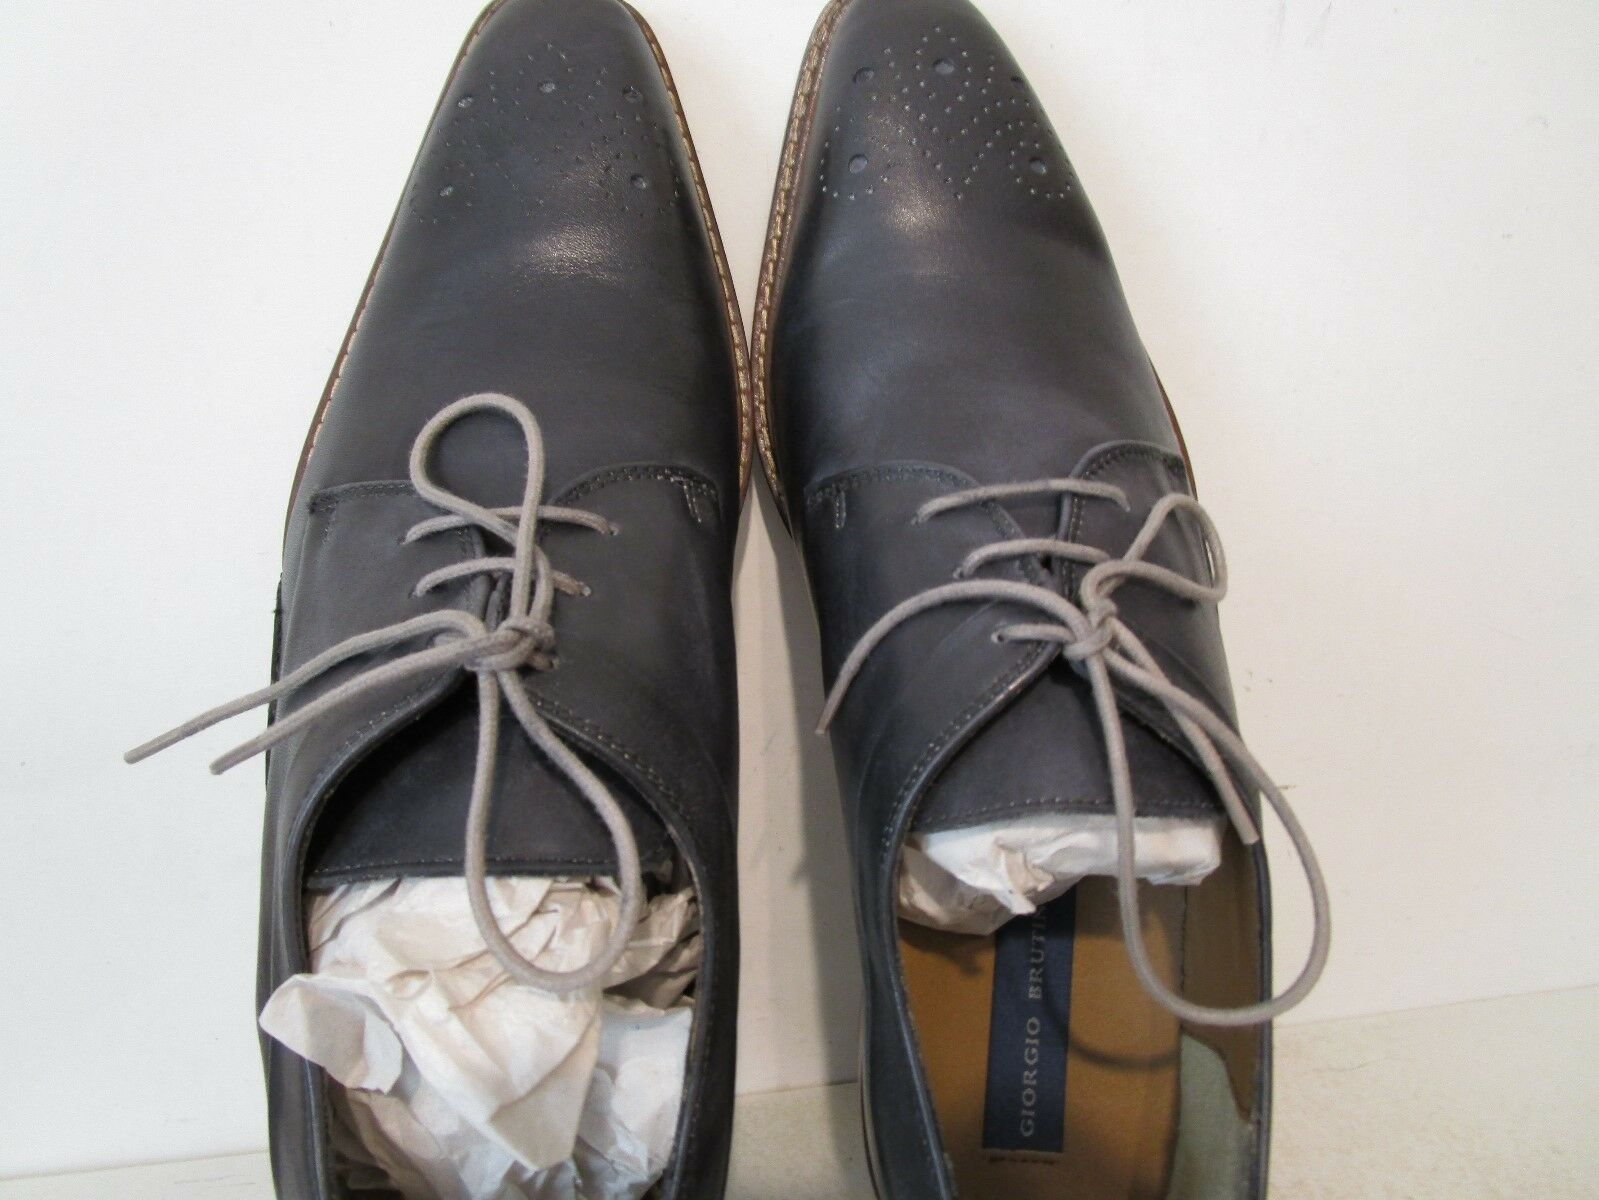 Giorgio Brutini Uomo Uomo Uomo Reddington 25072 Pelle Oxford Dress Shoes Gray Size 13 M 3223da